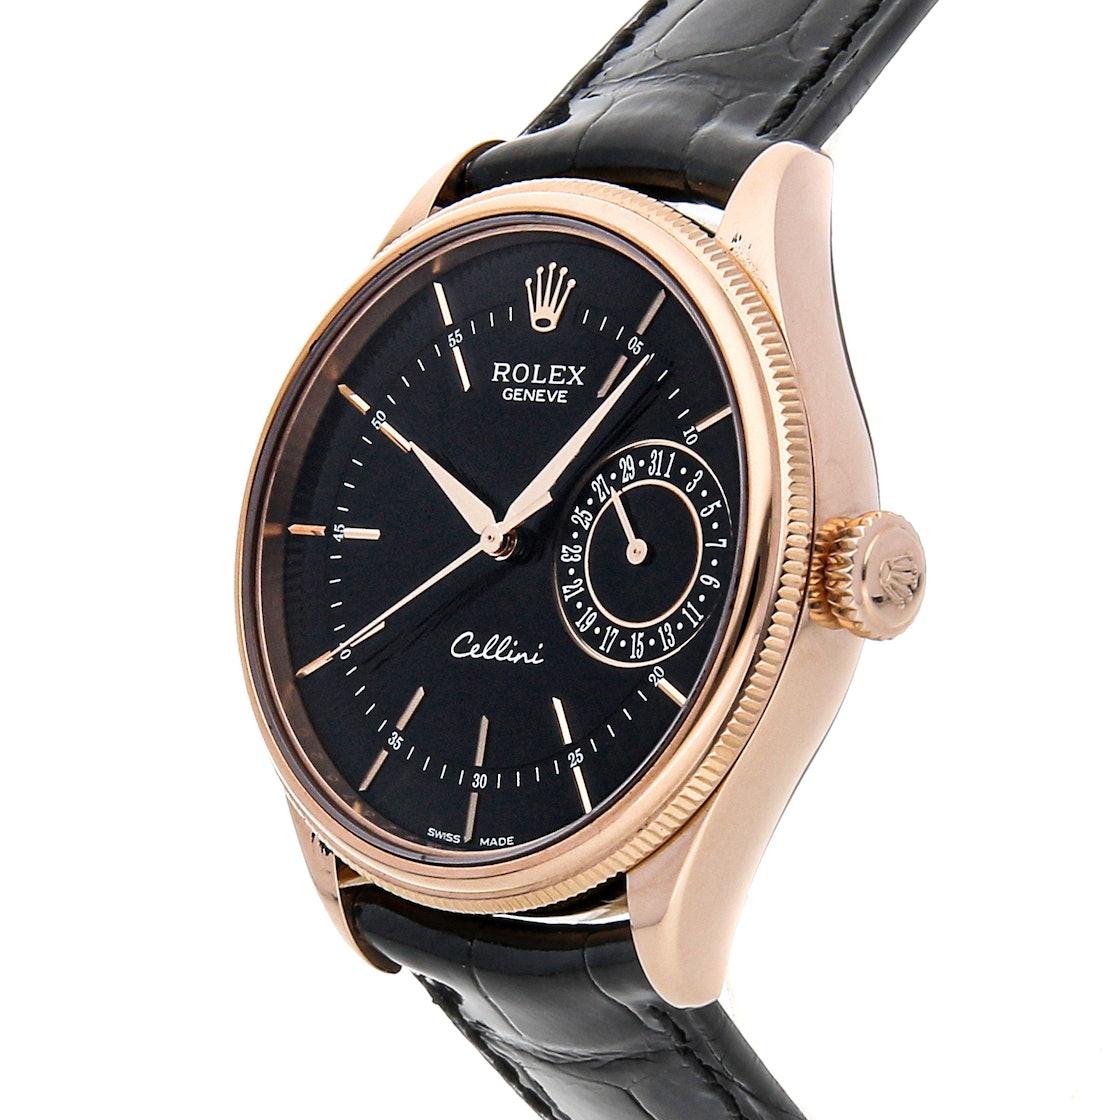 Rolex Cellini Date 50515